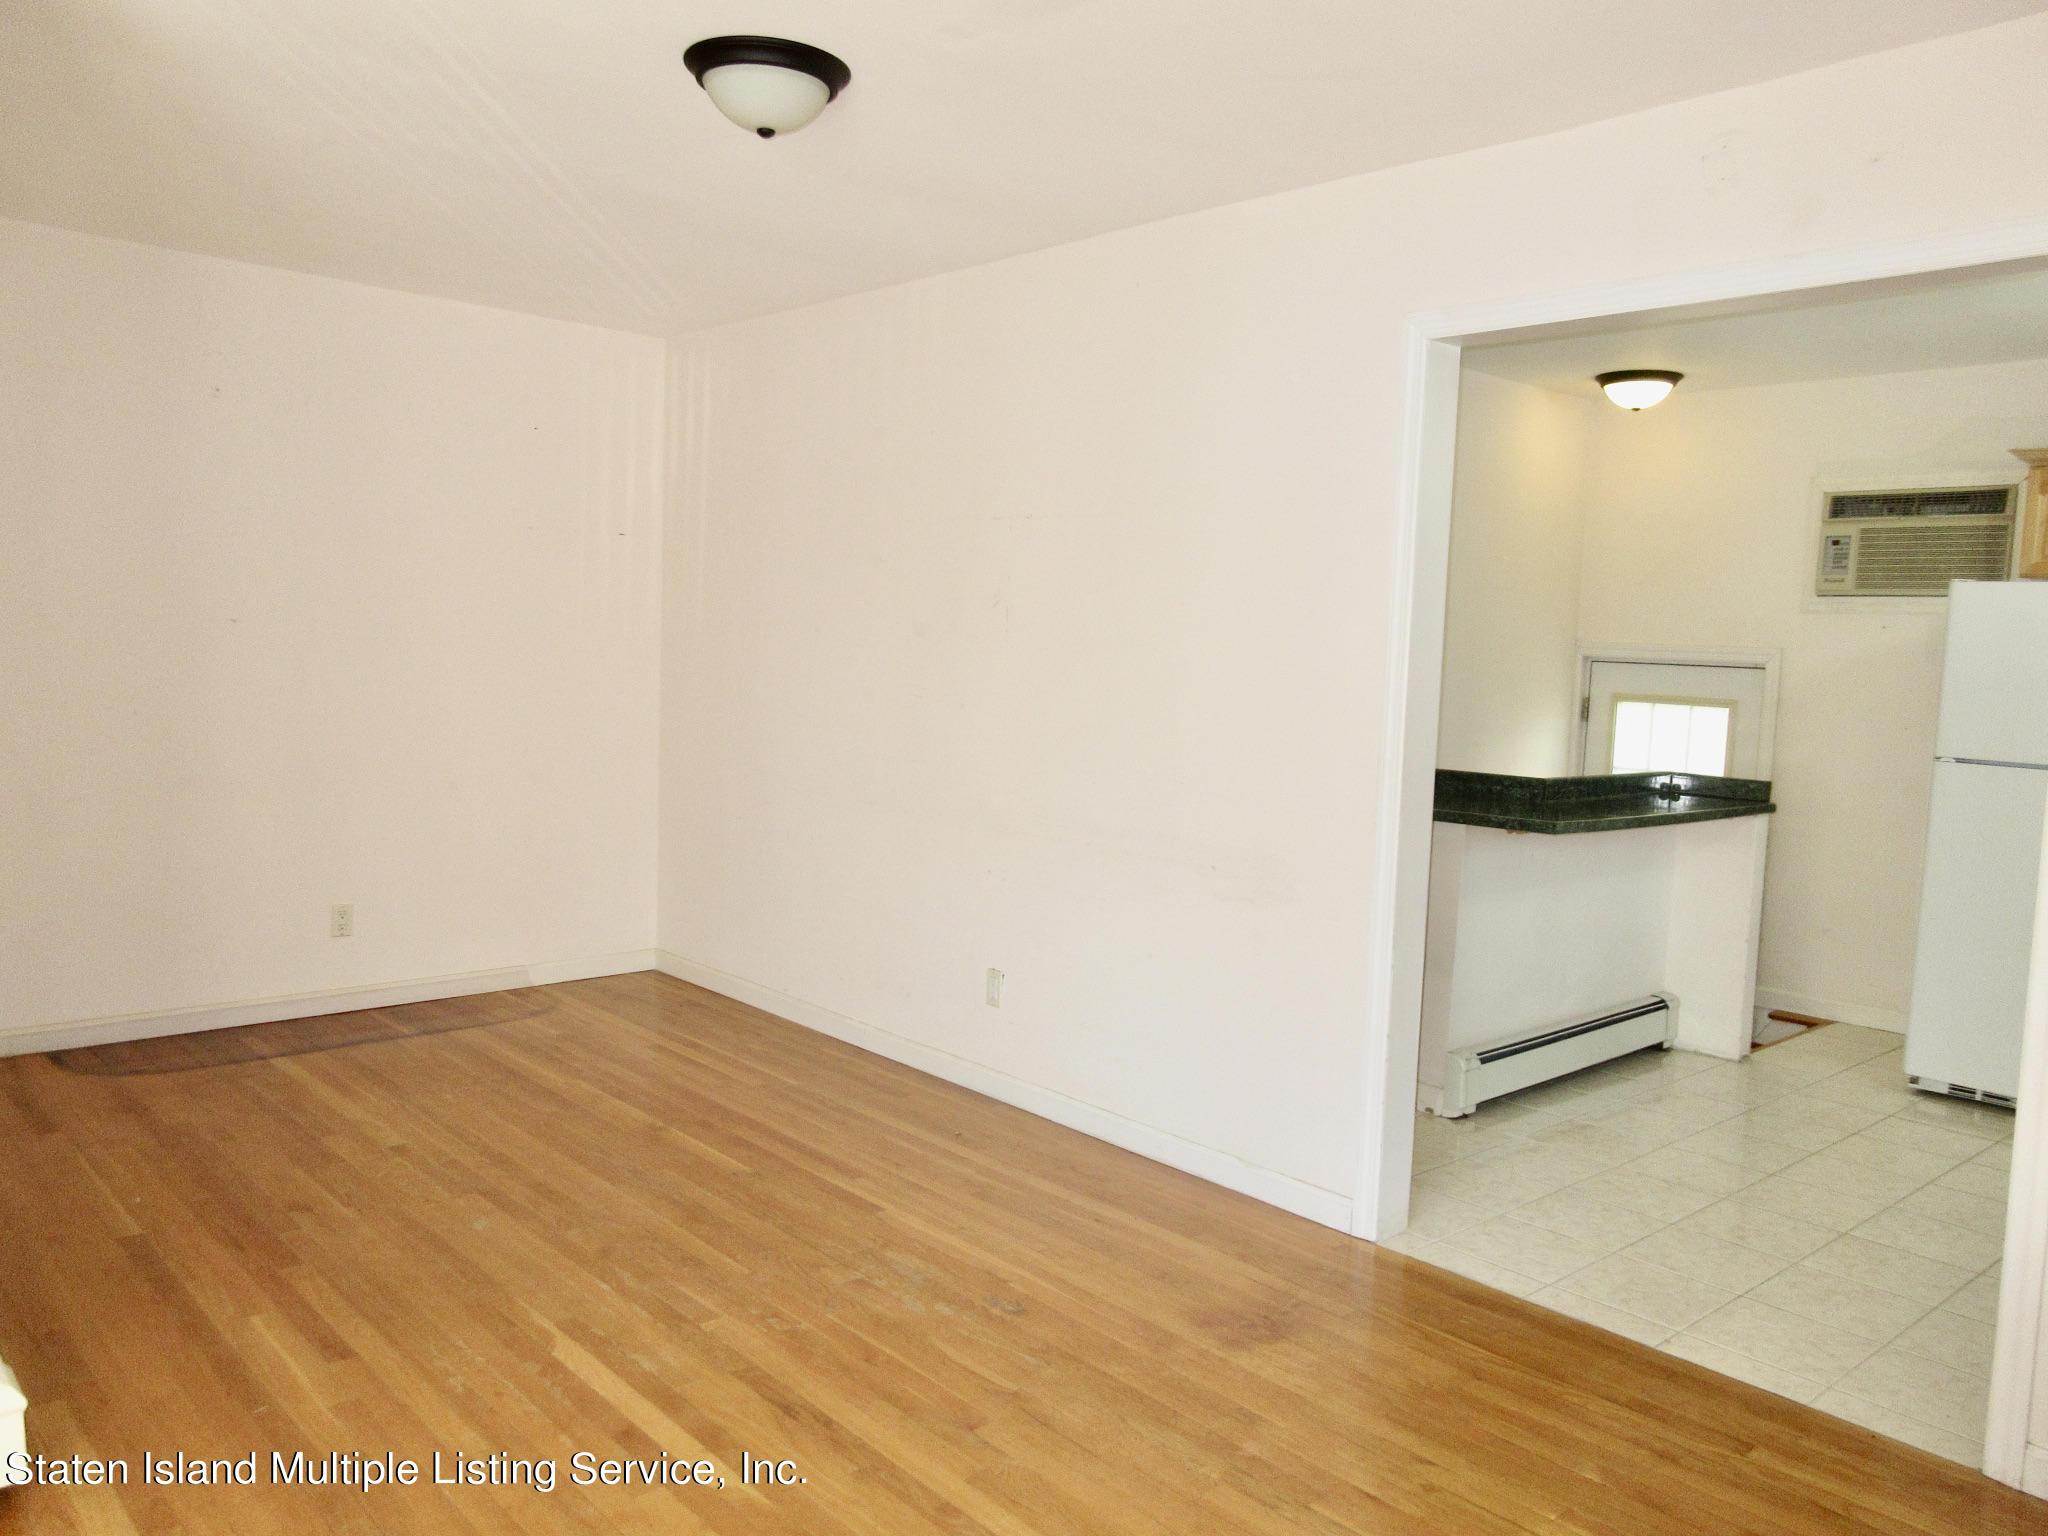 Two Family - Detached 89-91 David Street  Staten Island, NY 10308, MLS-1146516-14